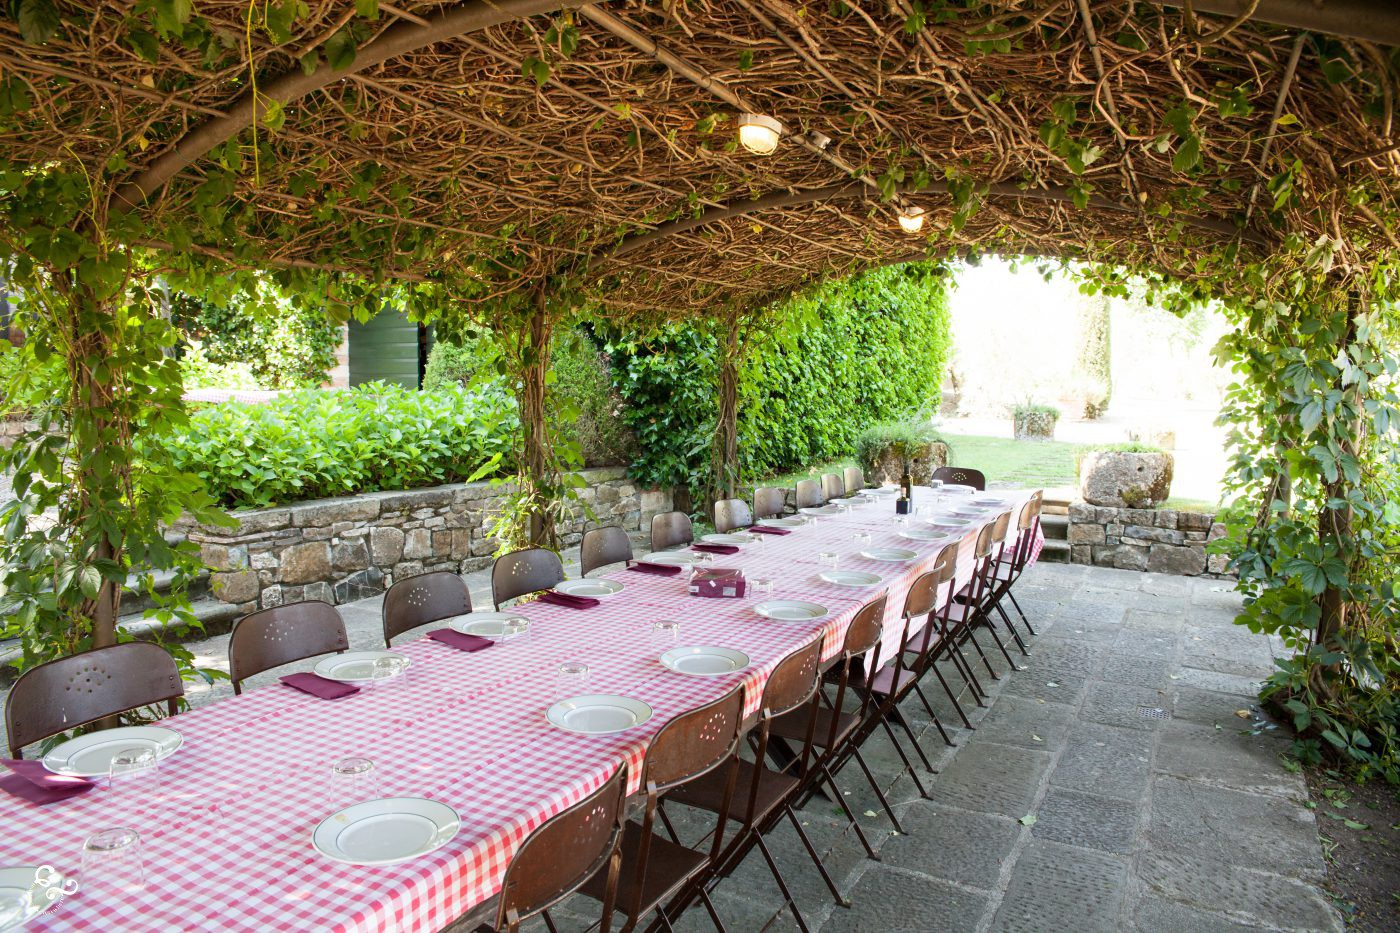 Scenes and Towns of Tuscany Italy Nowhere & Everywhere Lis Dingjan Photography San Gimigano Volterra Volpaia Radda Chianti Crete Senesi Siena Chiusure Buonconvento Certaldo